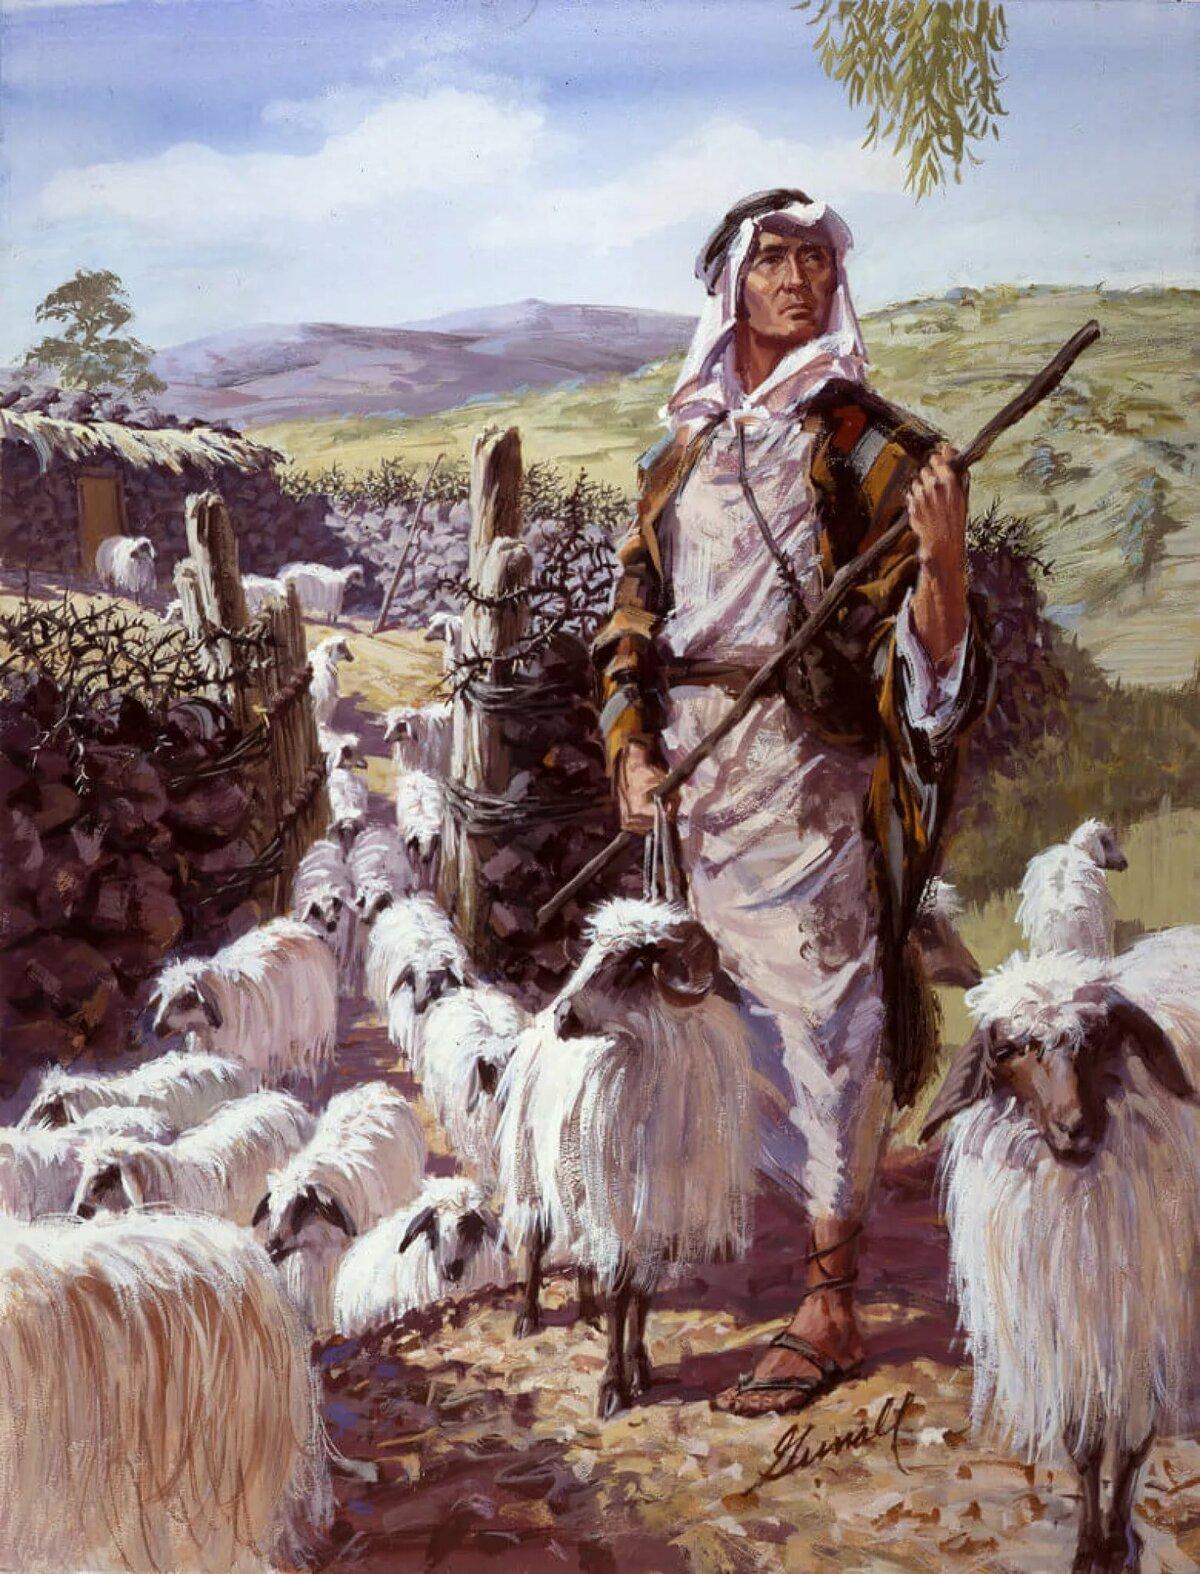 картинки пастухов и пастушек длинную базу